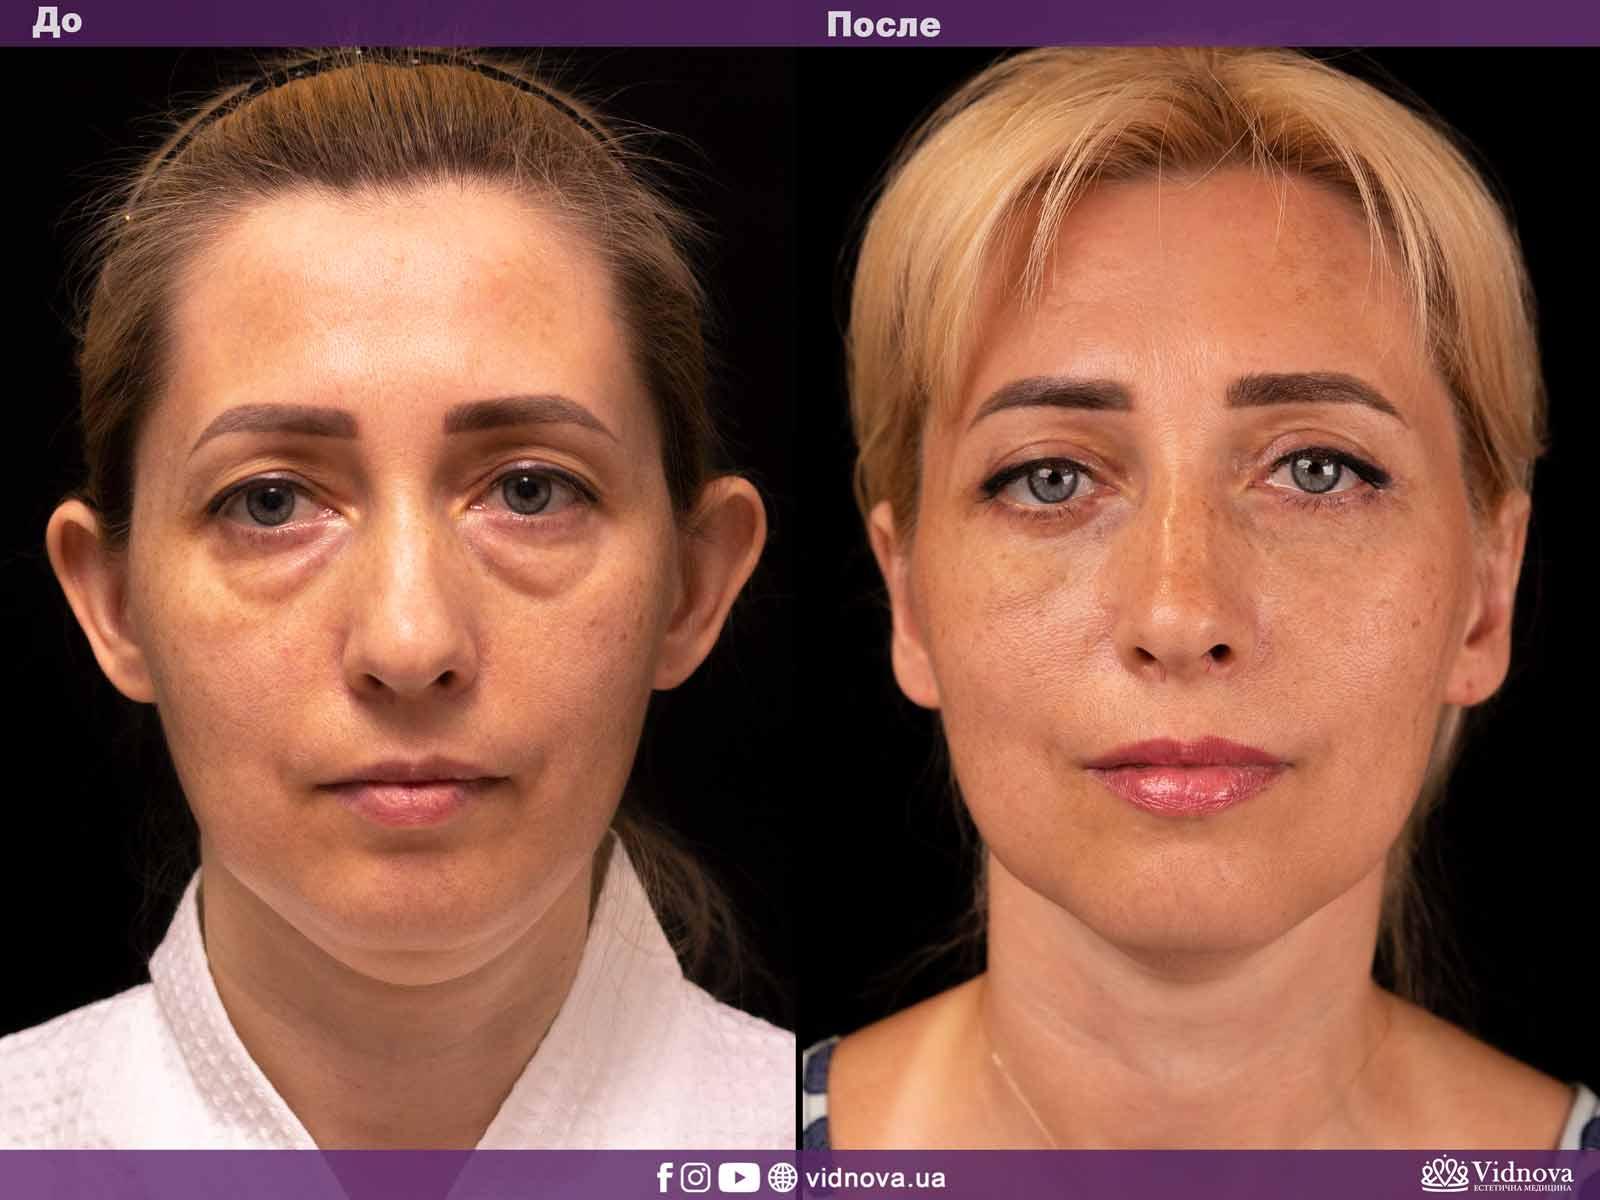 Блефаропластика: Фото До и После - Пример №3-1 - Клиника Vidnova